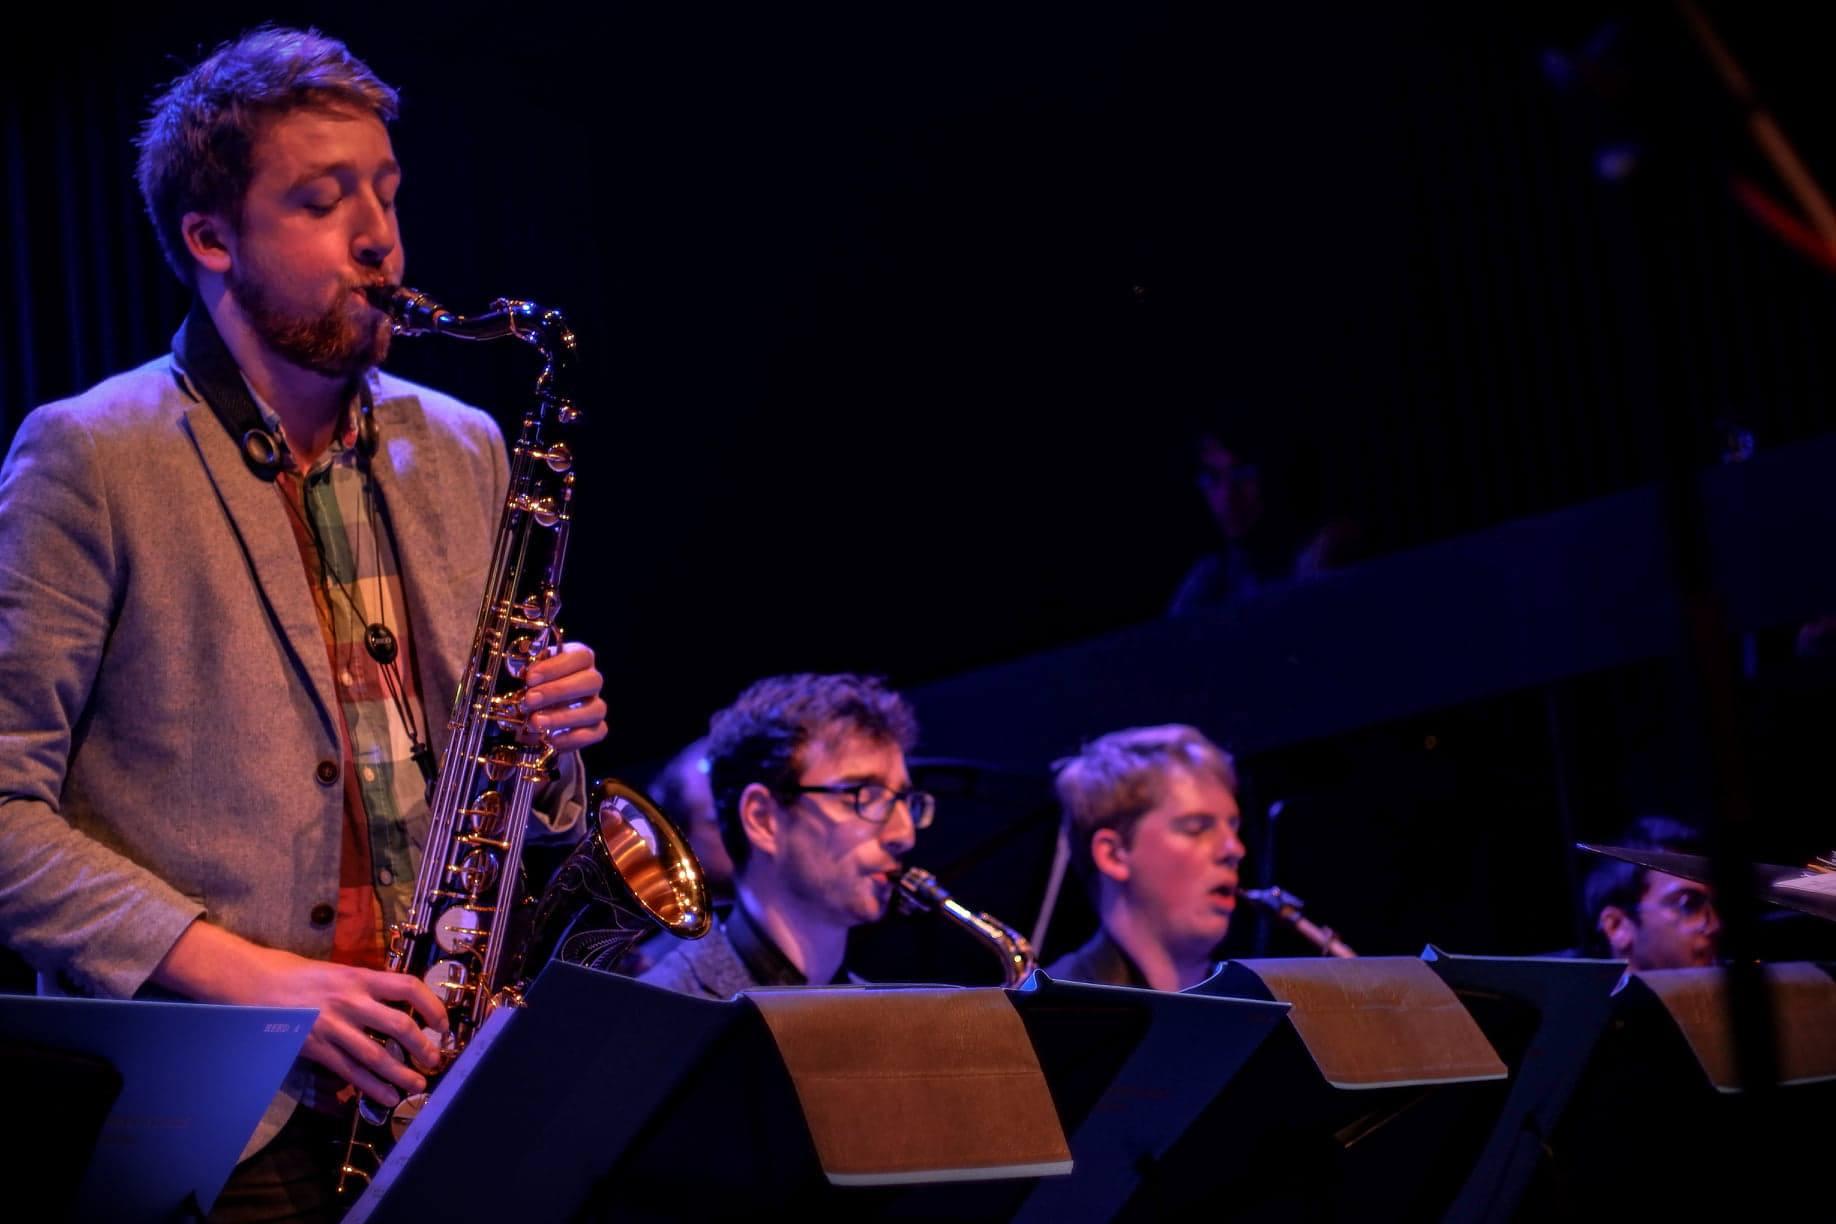 Oliver stanton jazz session.jpg